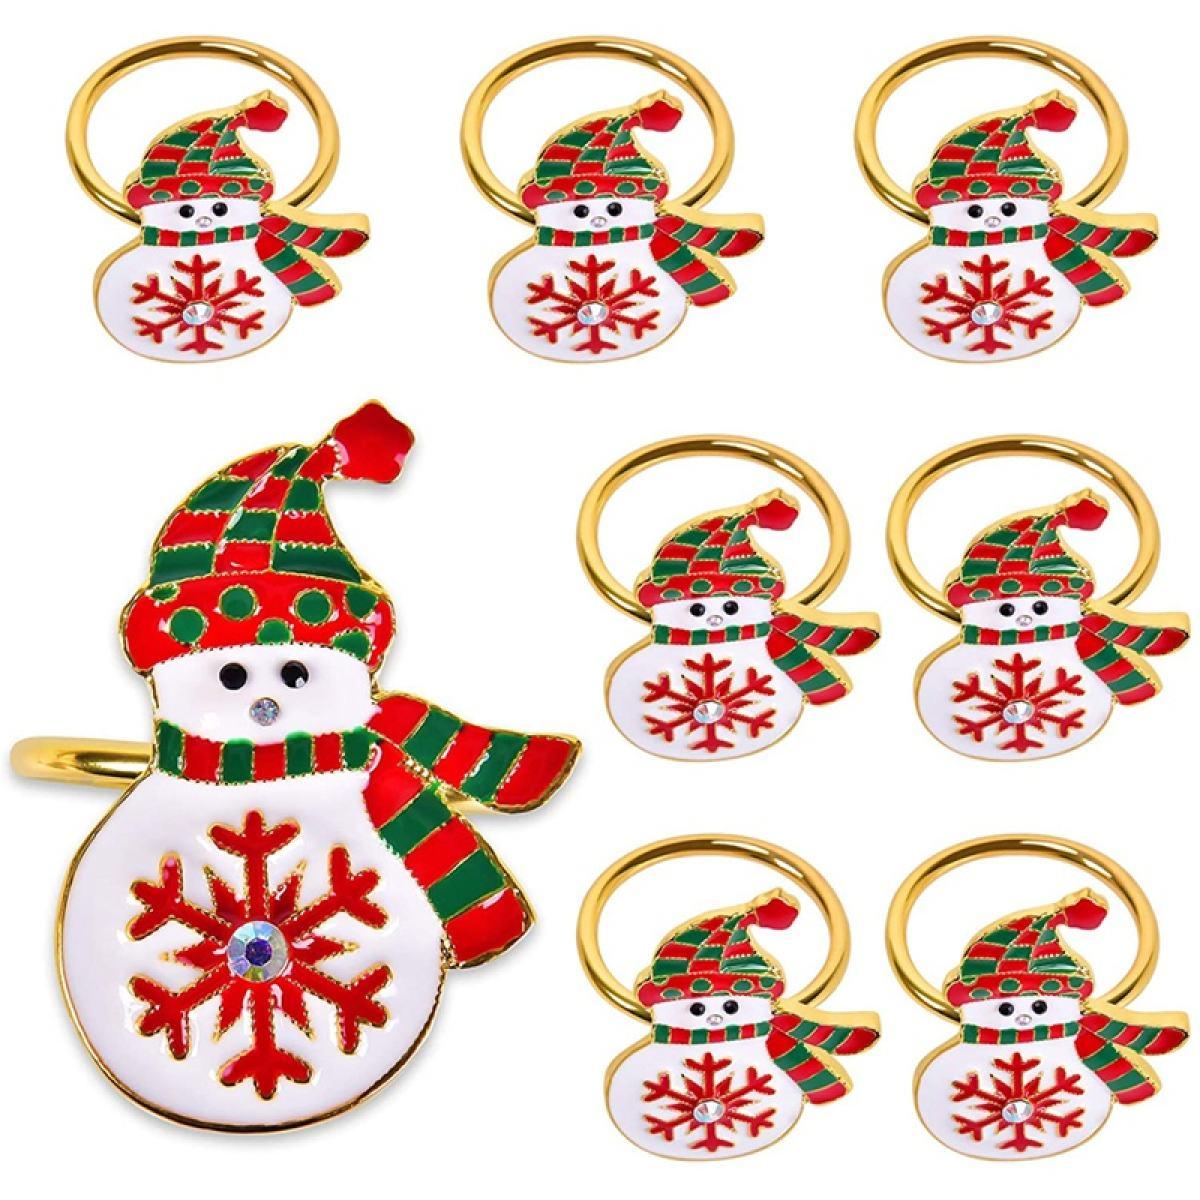 Napkin Rings Christmas Napkin Rings Sef Of 8 Xmas Napkin Ring Dinner Tables Rings For Christmas Thanksgiving Weddings Lazada